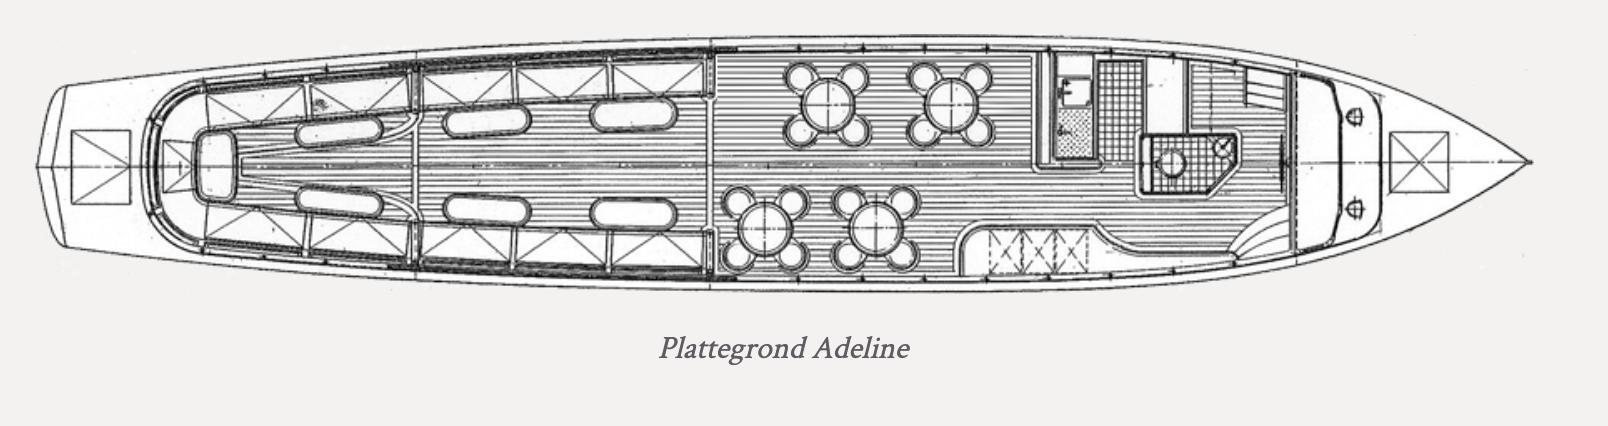 Adeline plattegrond